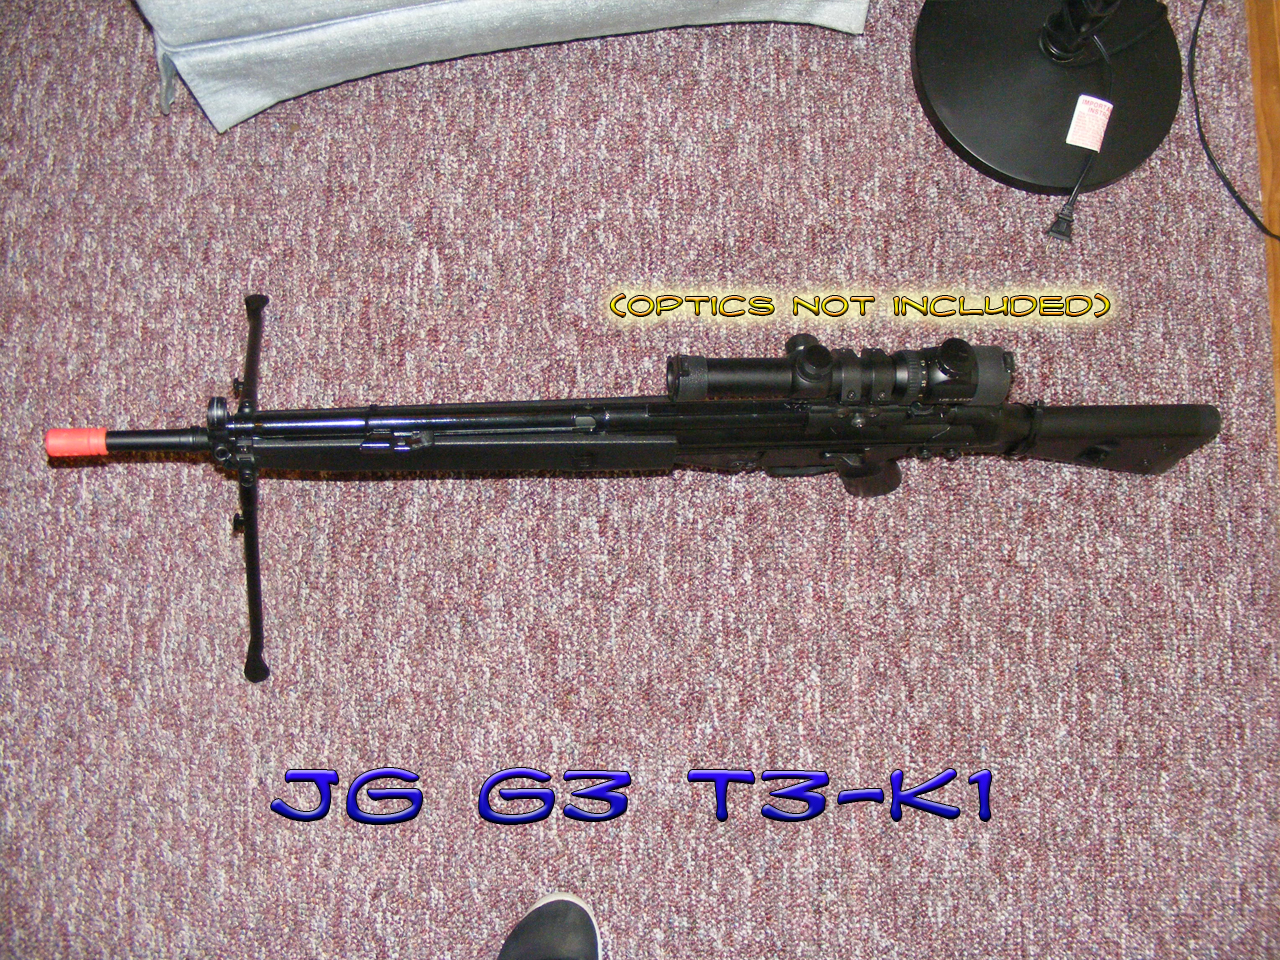 g33.jpg